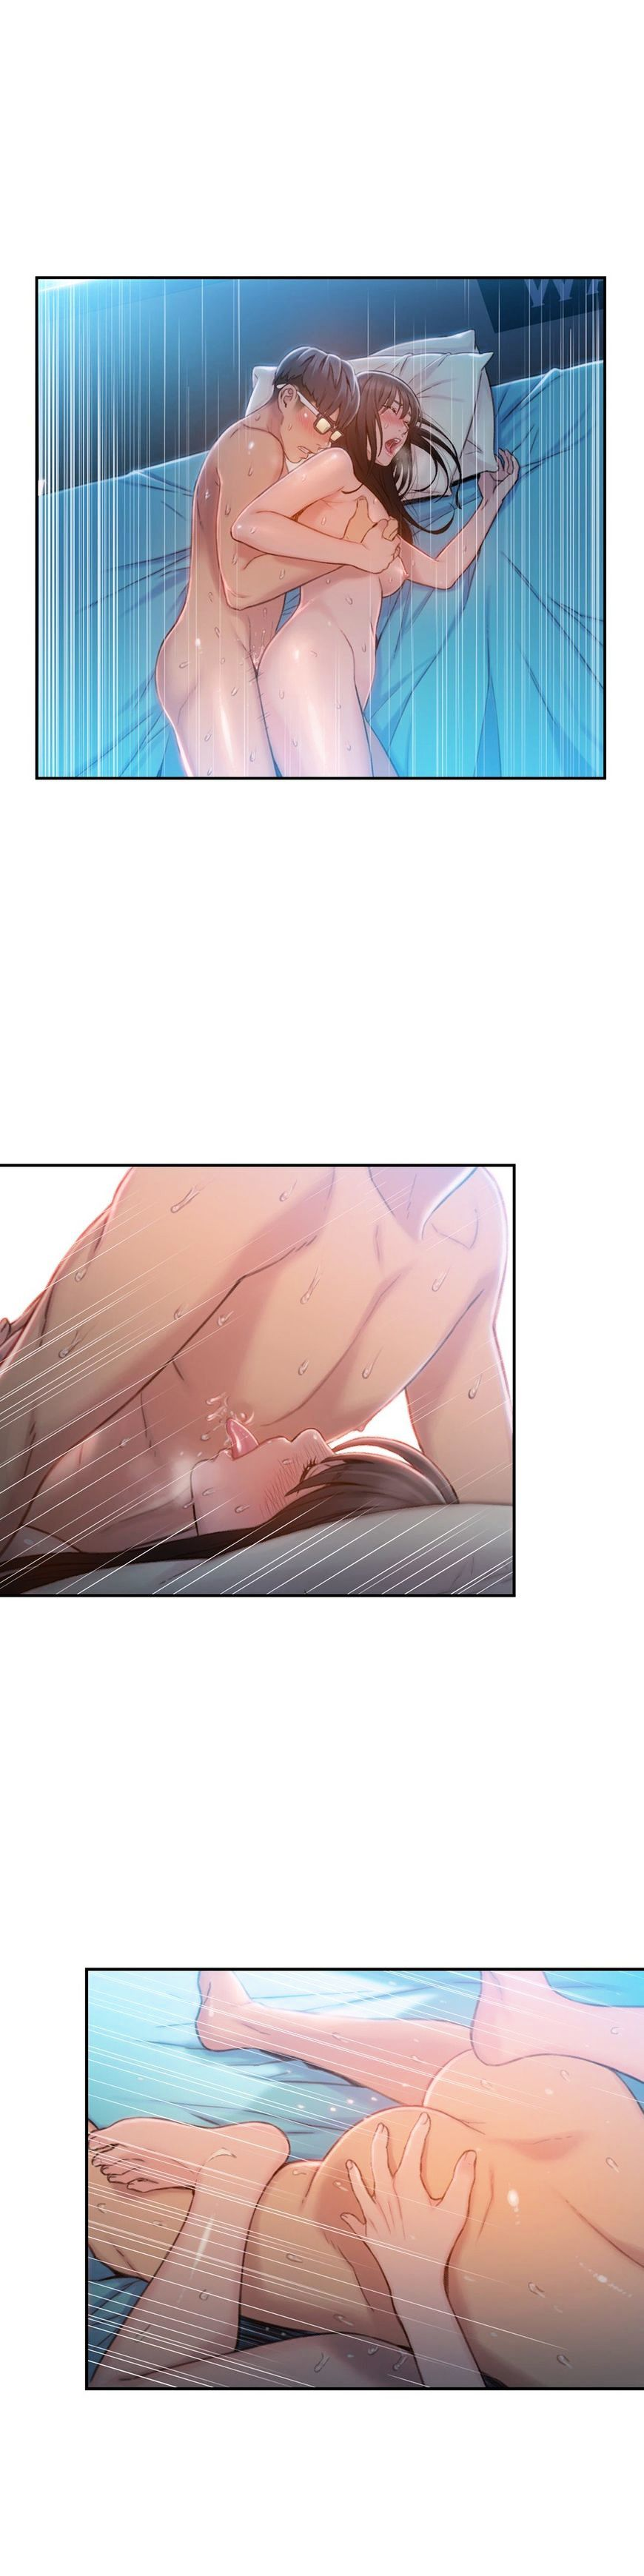 Sweet Guy Chapter 74 Full Manga Read Scan Image 23